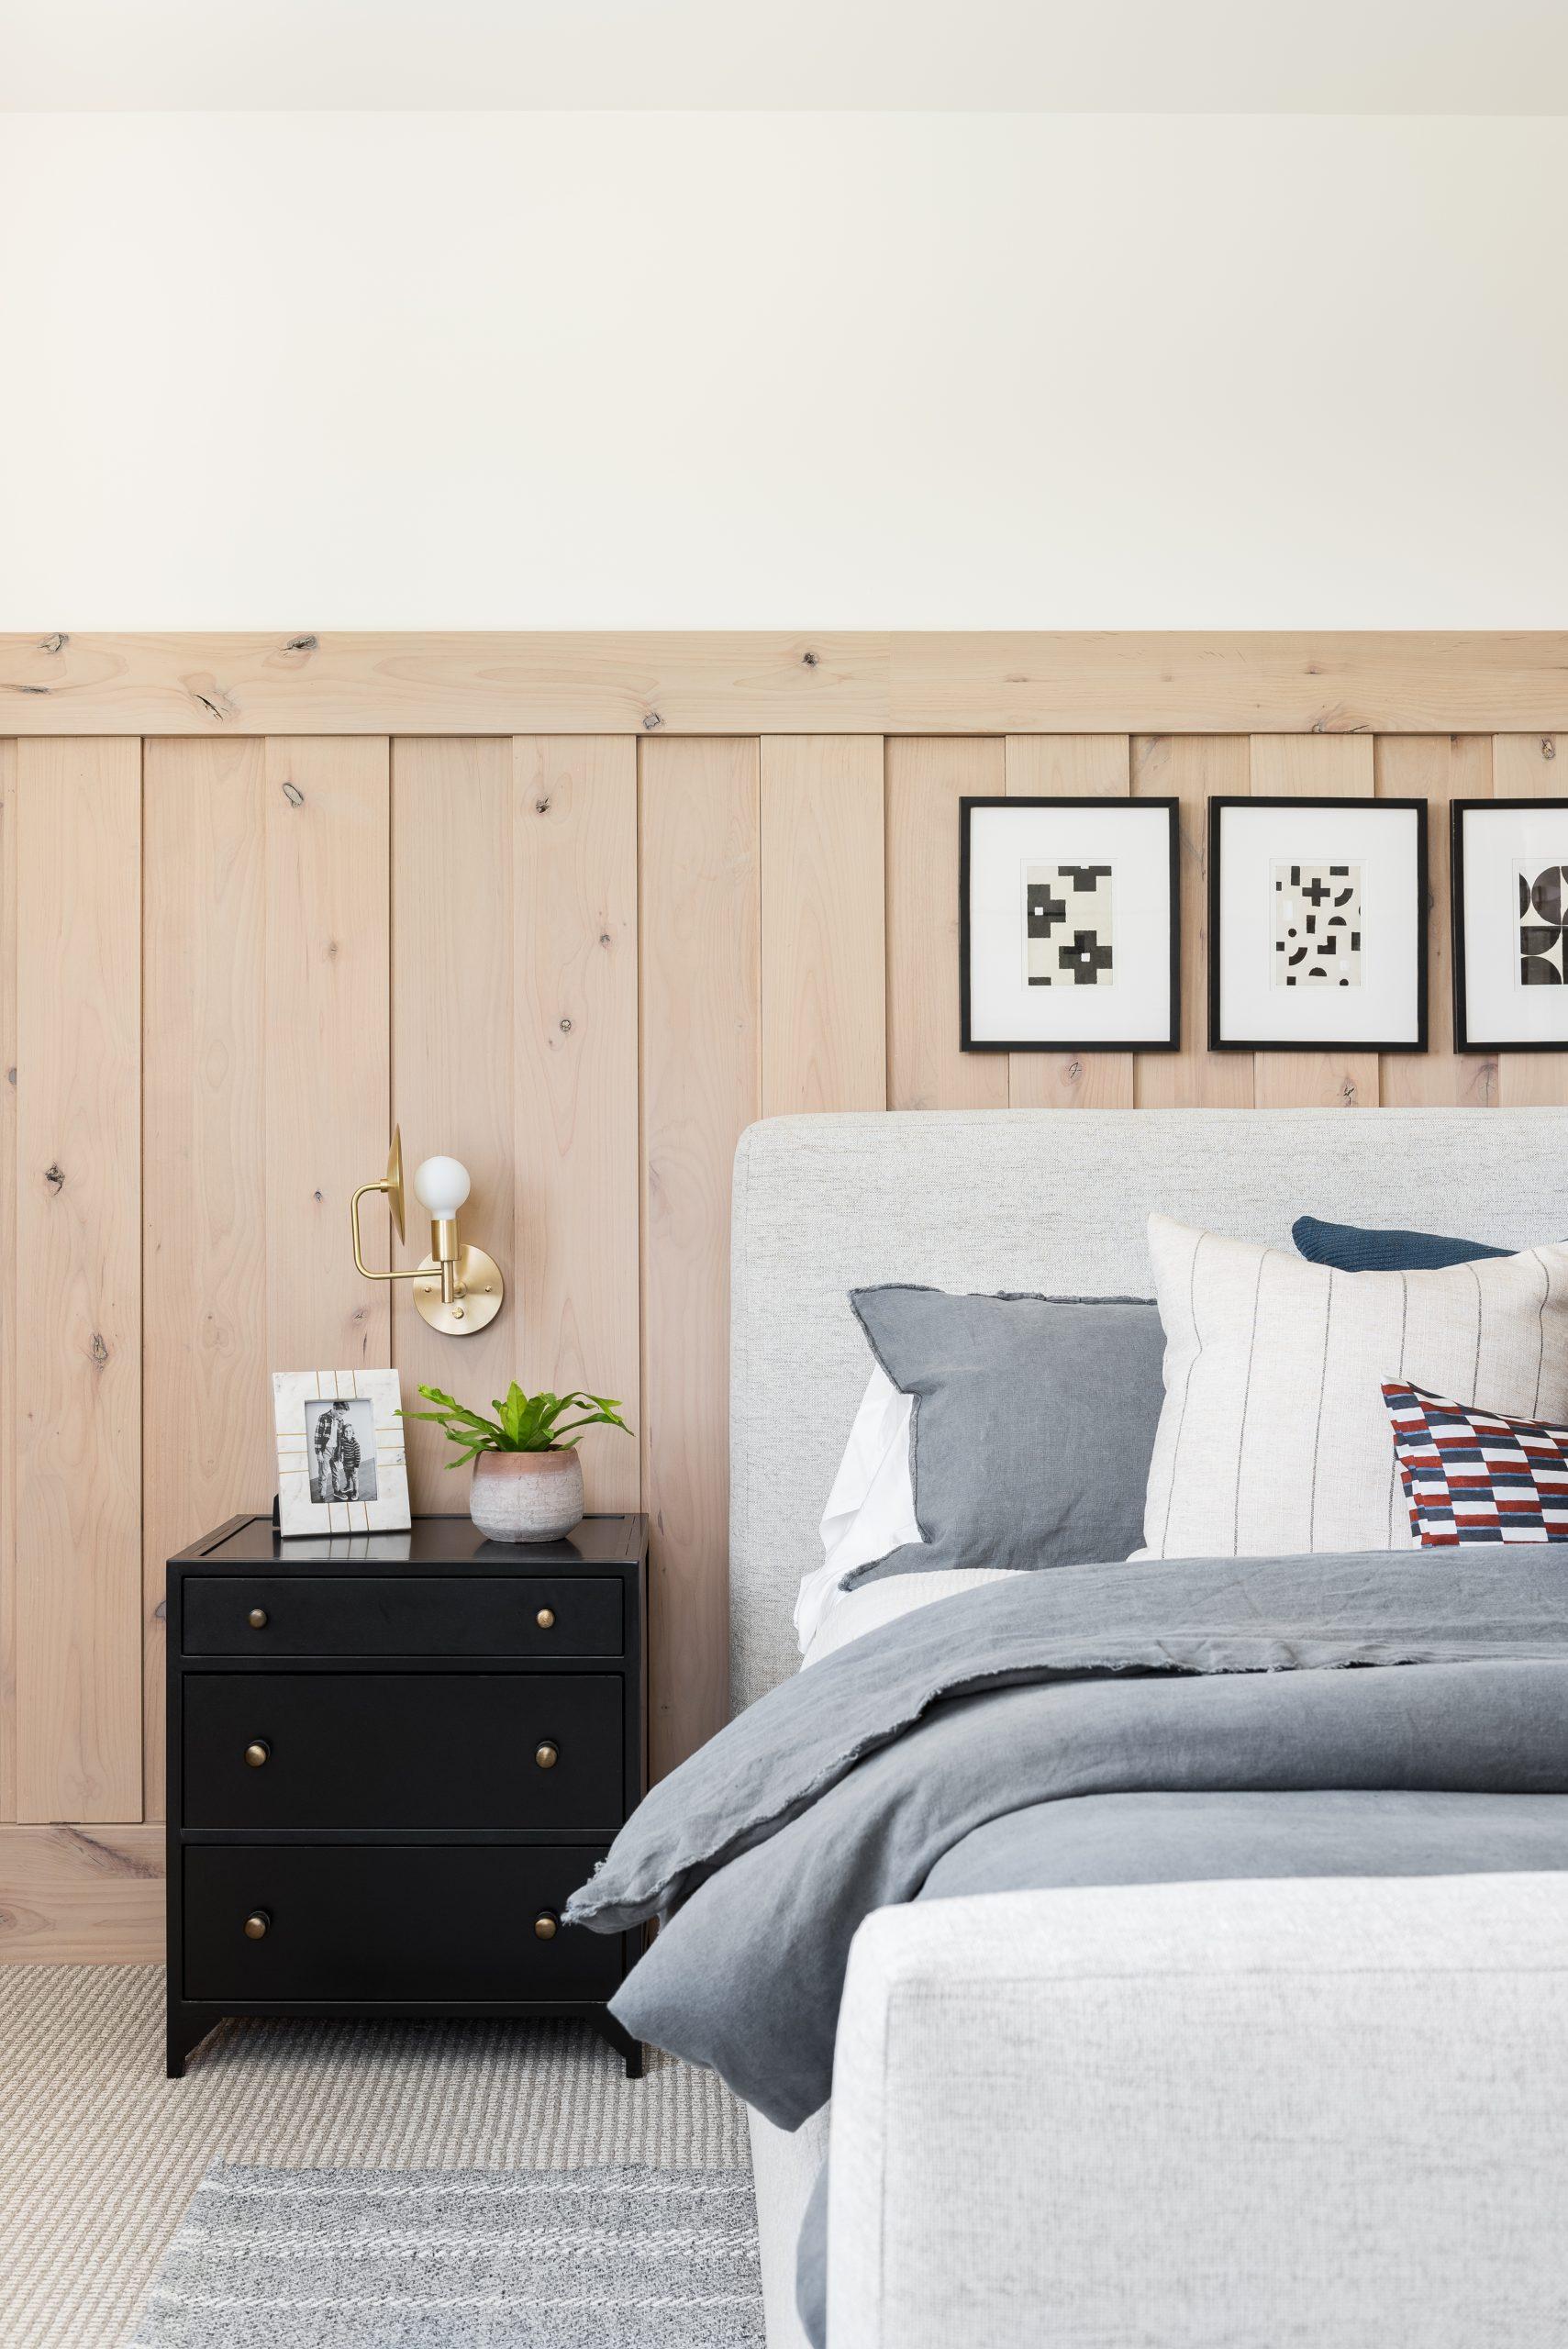 5 Tips for Designing Kids Rooms